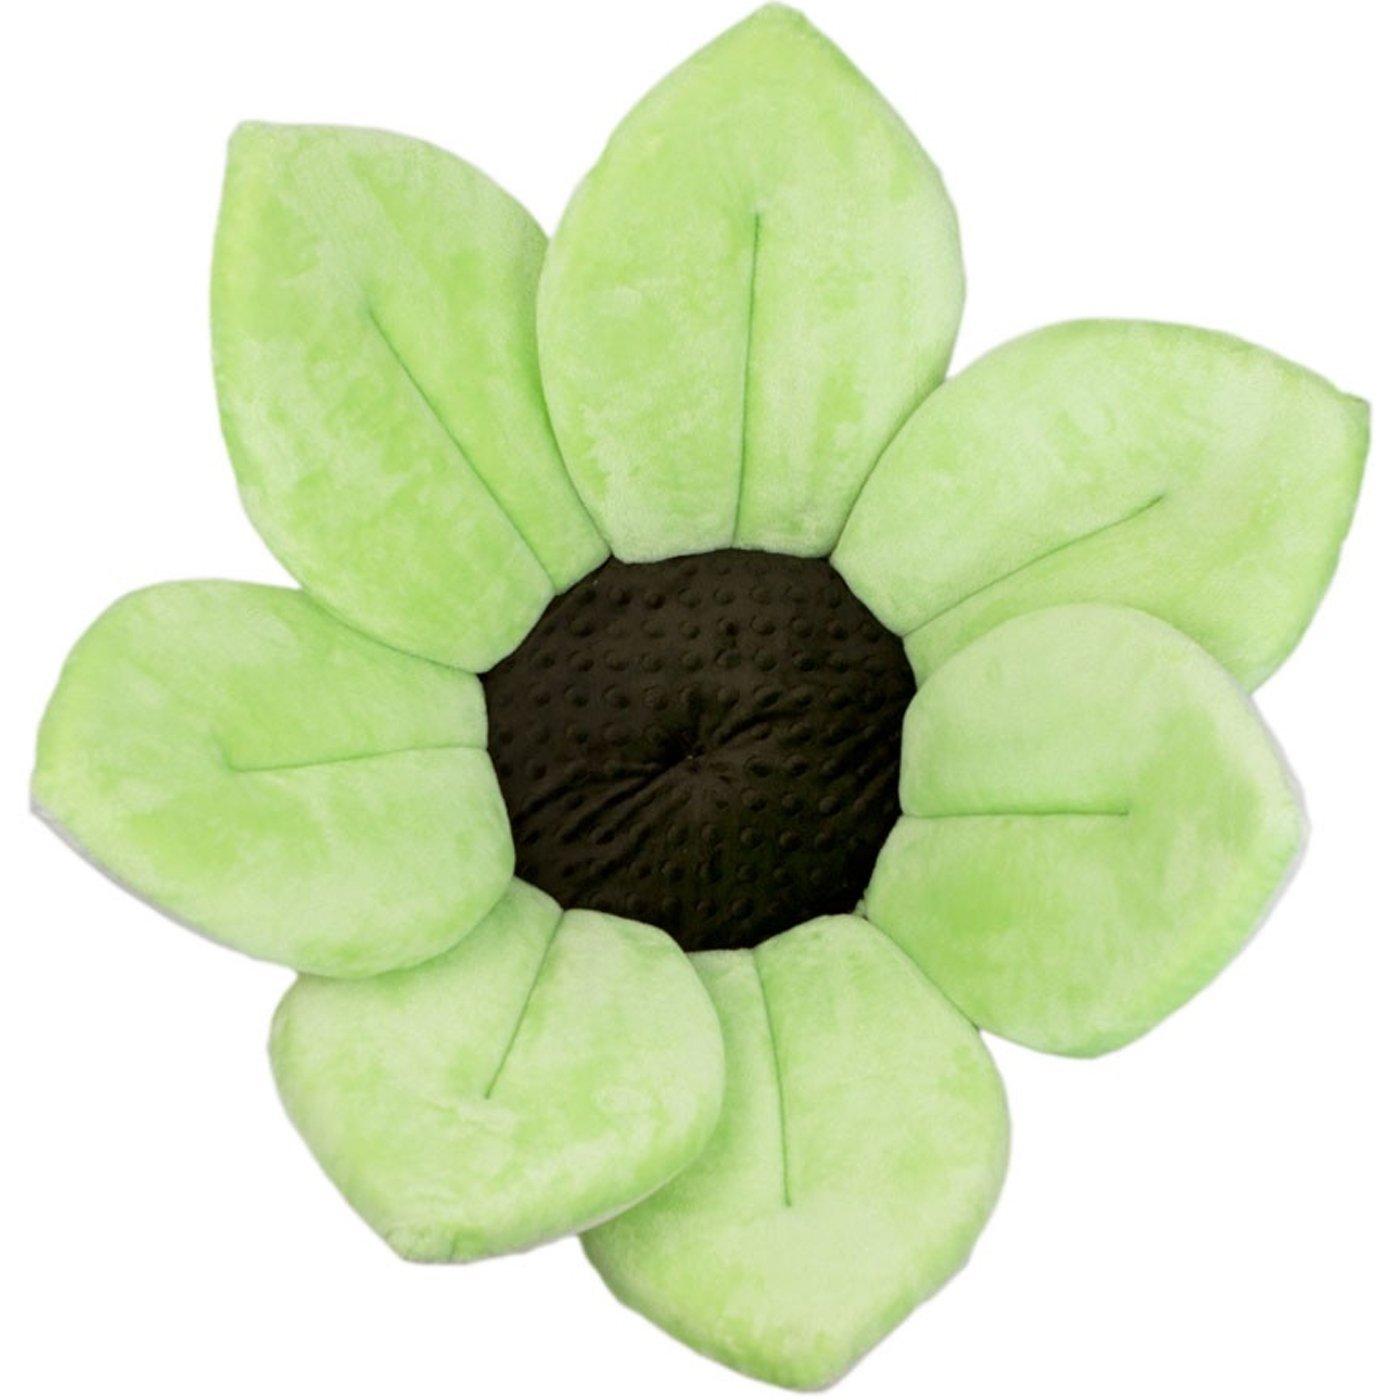 Blooming Bad Blume (Grün)